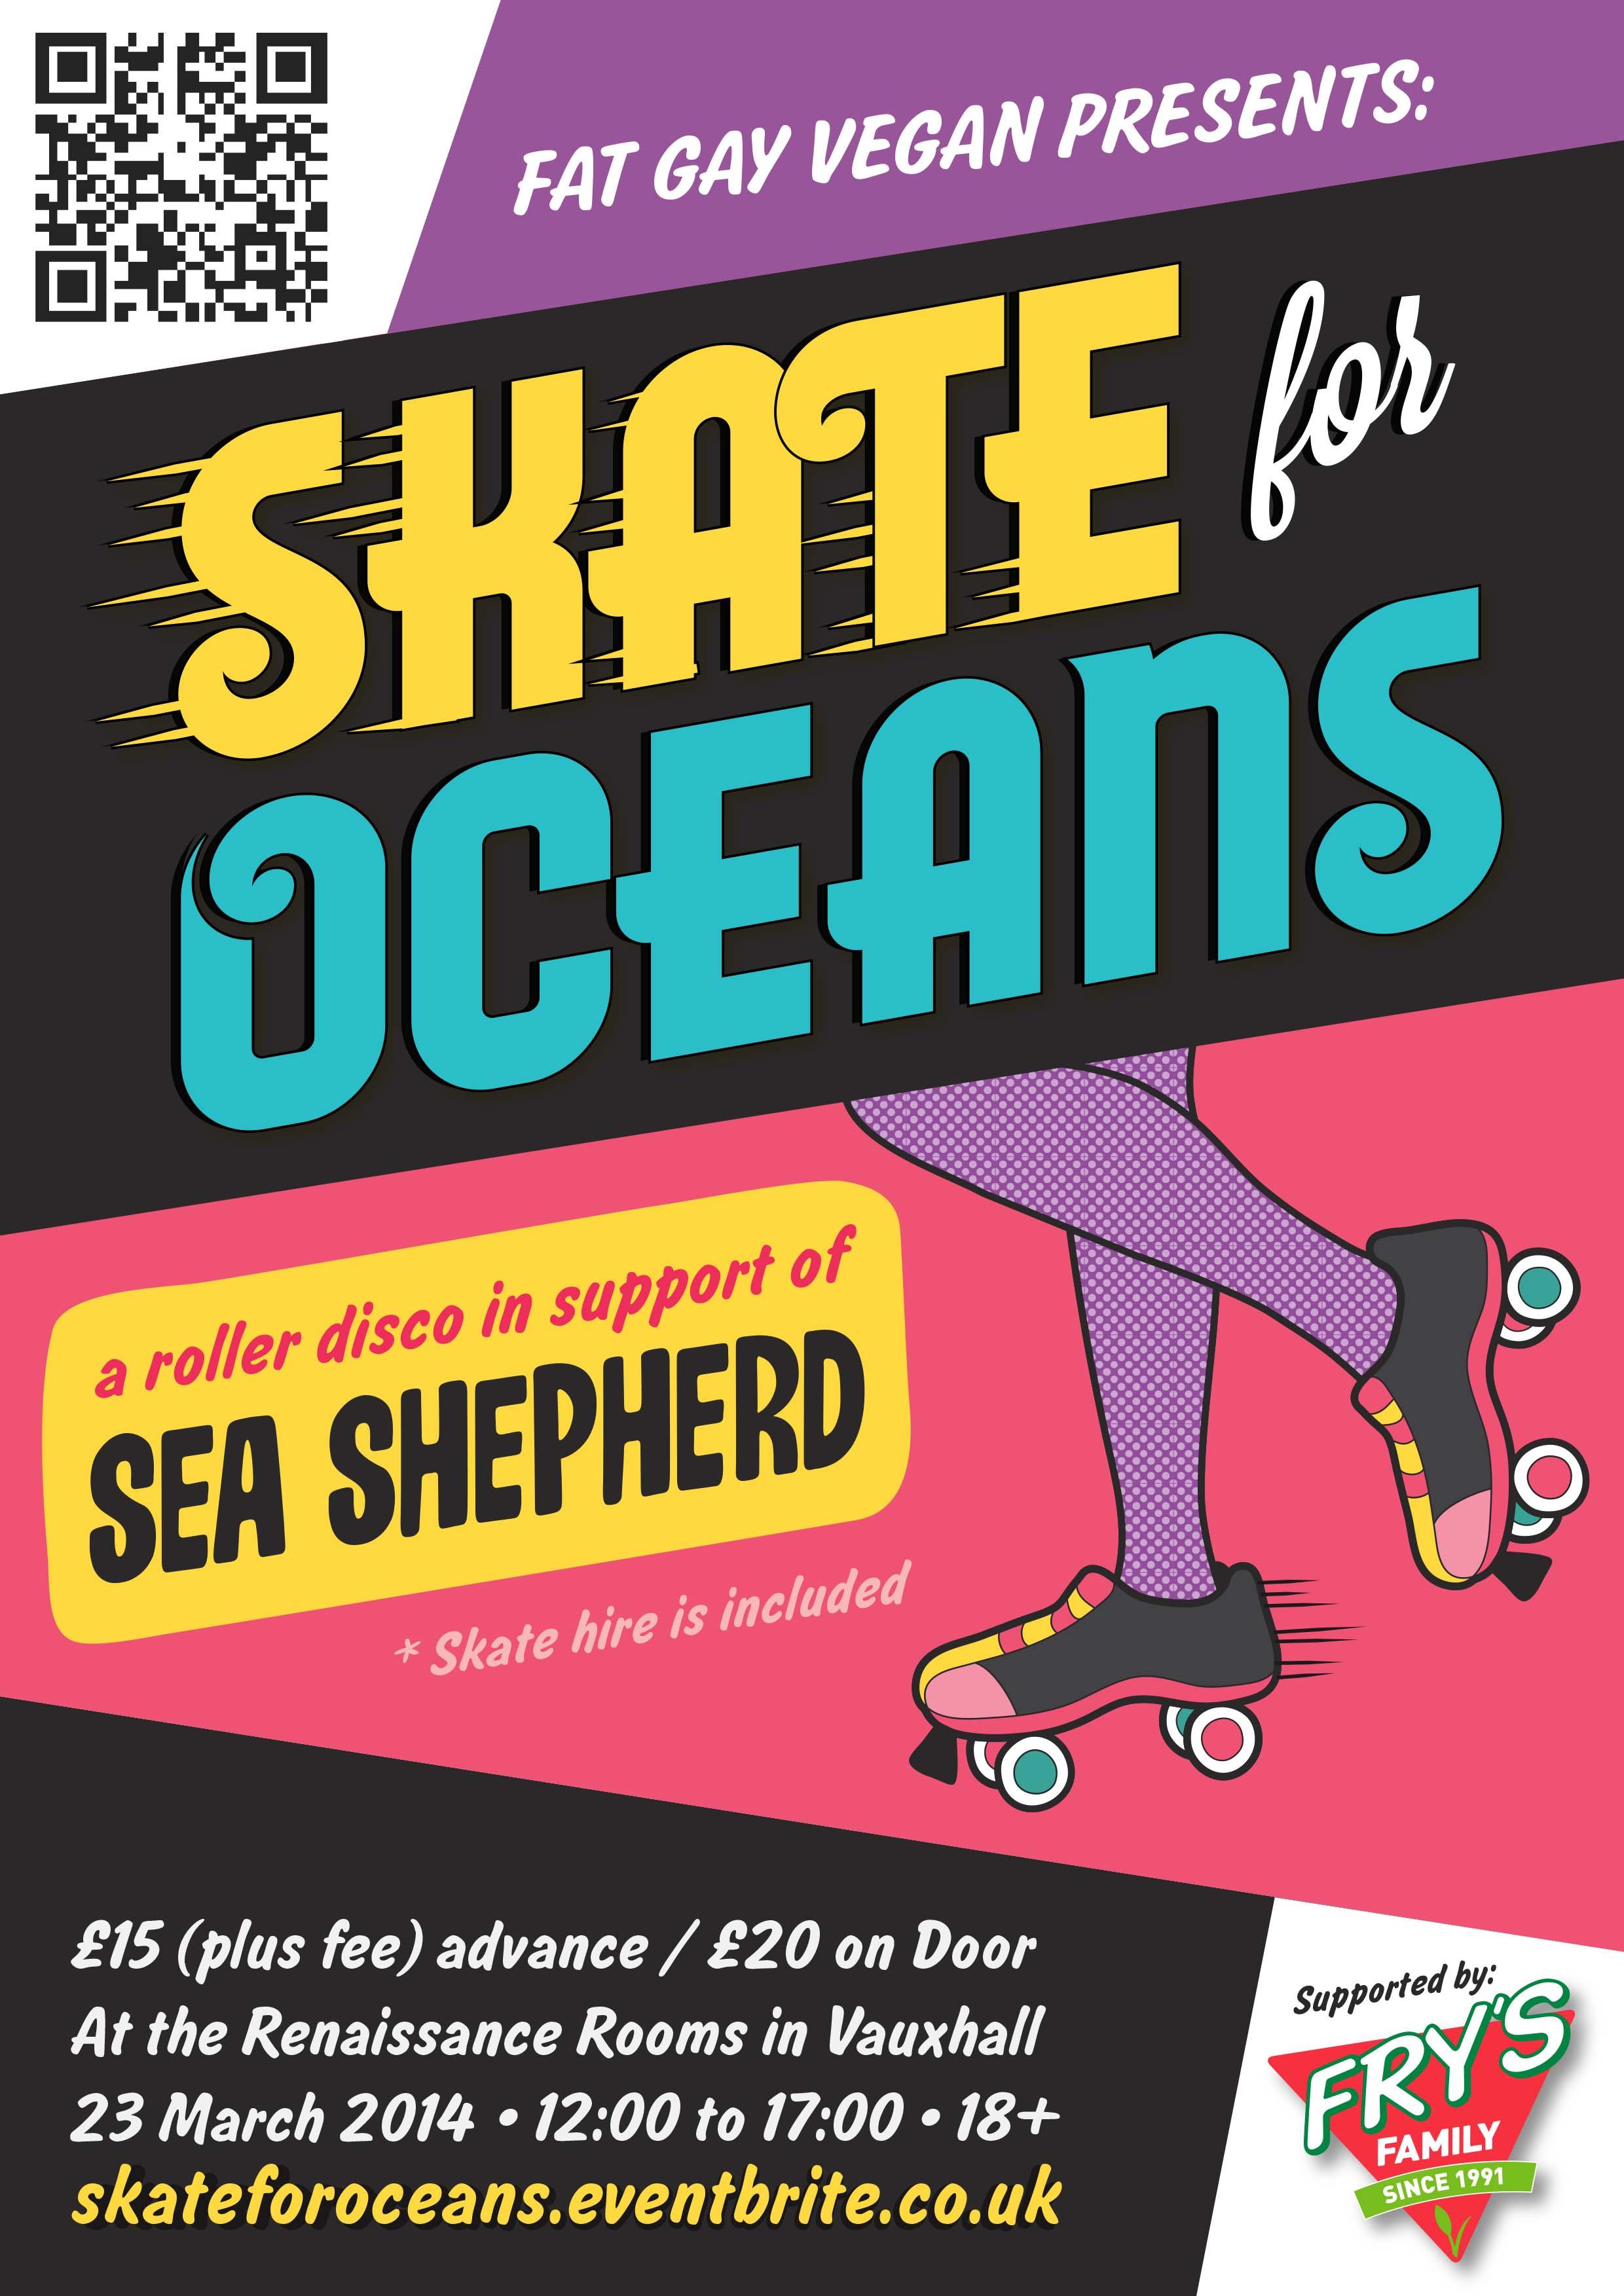 http://i1.wp.com/fatgayvegan.com/wp-content/uploads/2014/01/skate-for-oceans-2014-a4-poster-02.jpg?fit=2480%2C3507